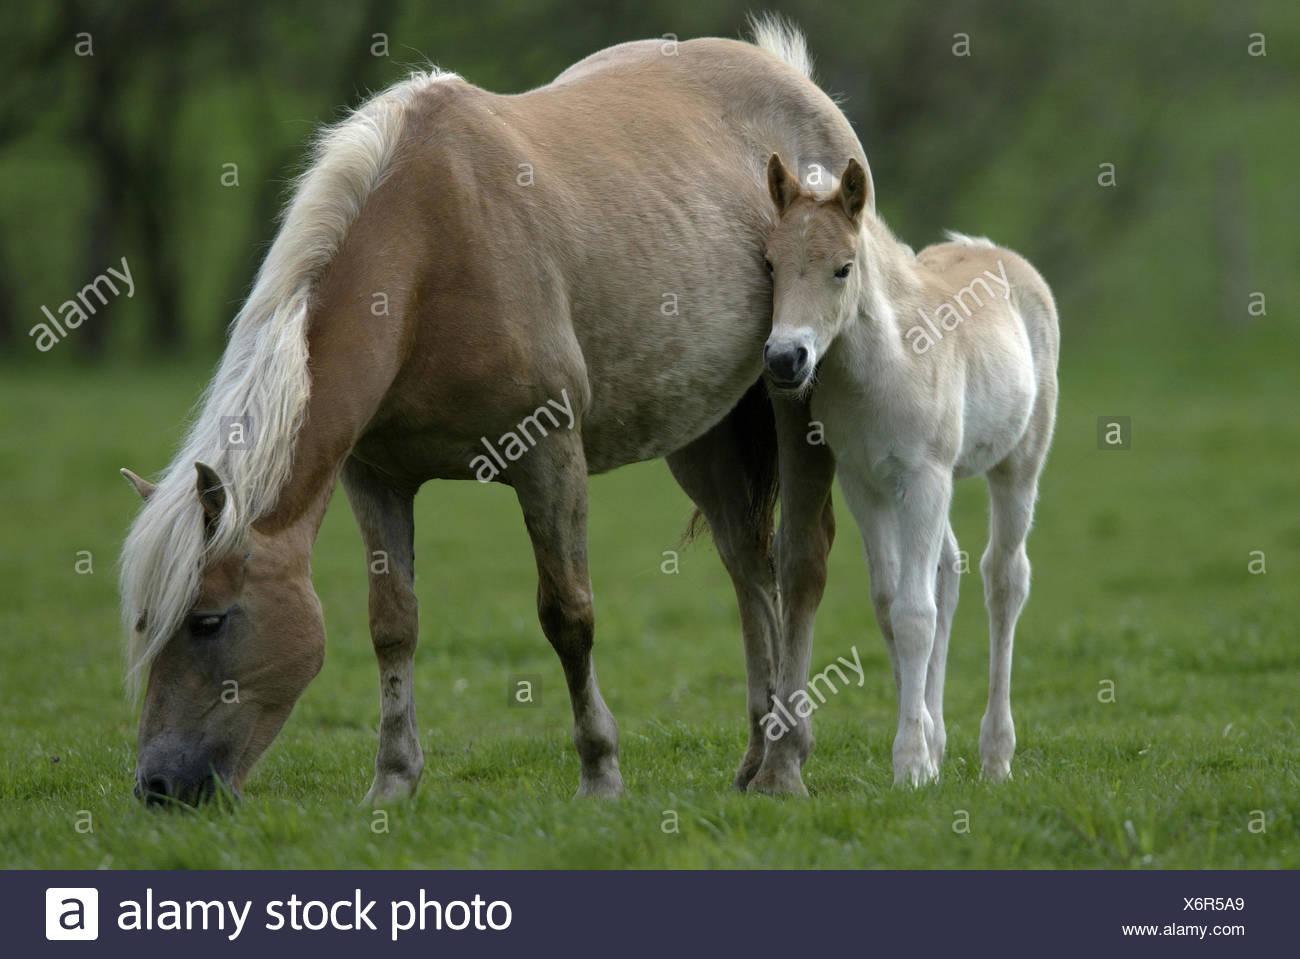 Haflinger Horse - Stock Image